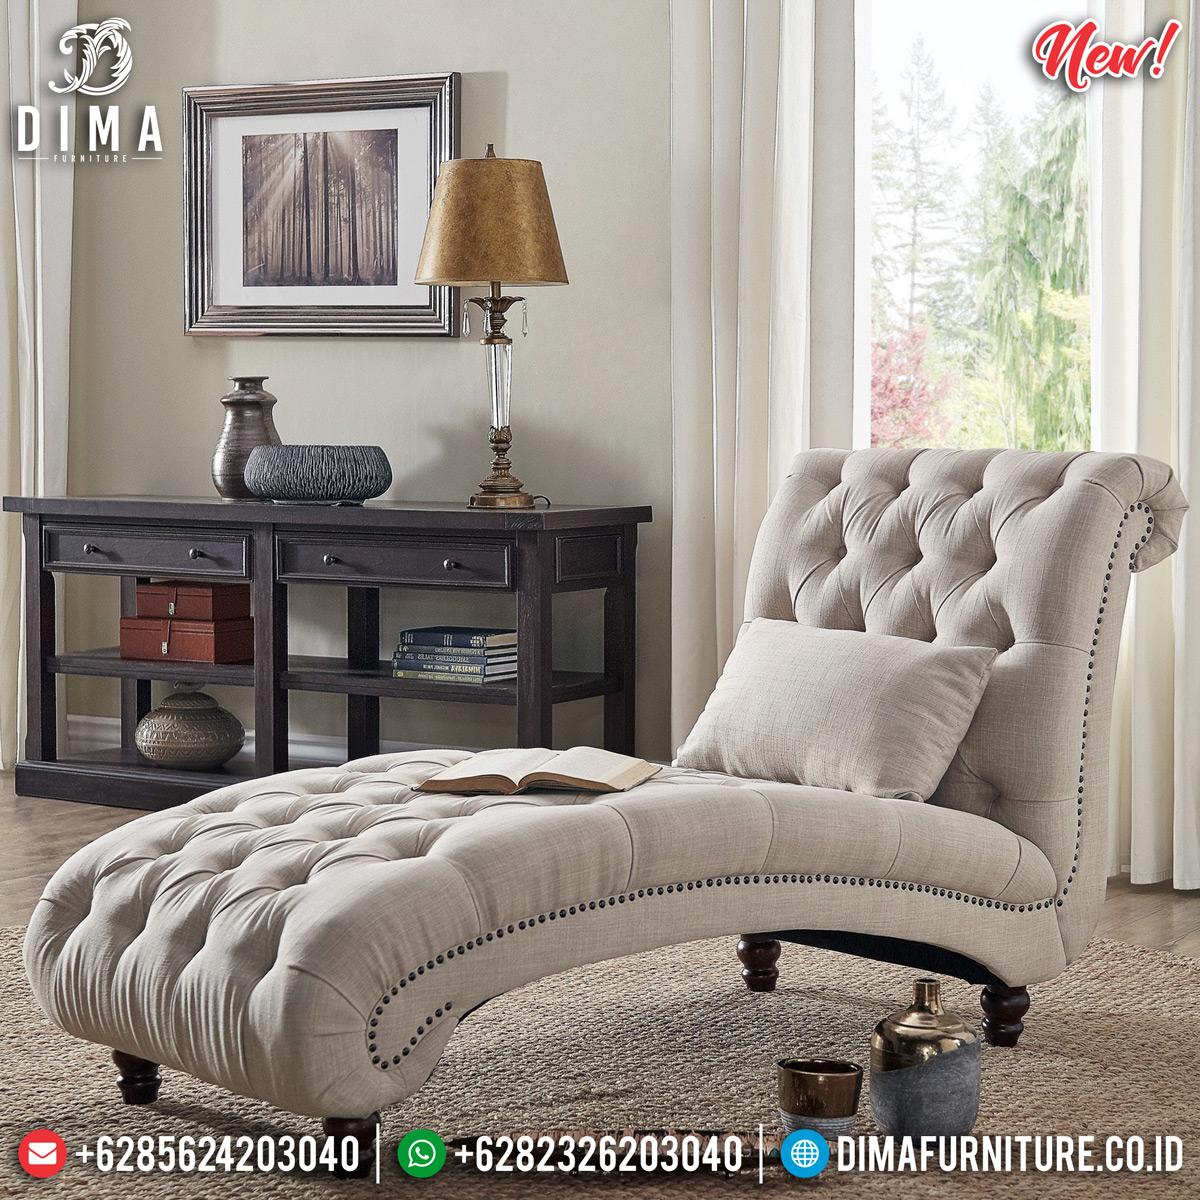 Harga Sofa Santai Minimalis Luxury Best Quality Venezia Model TTJ-0810